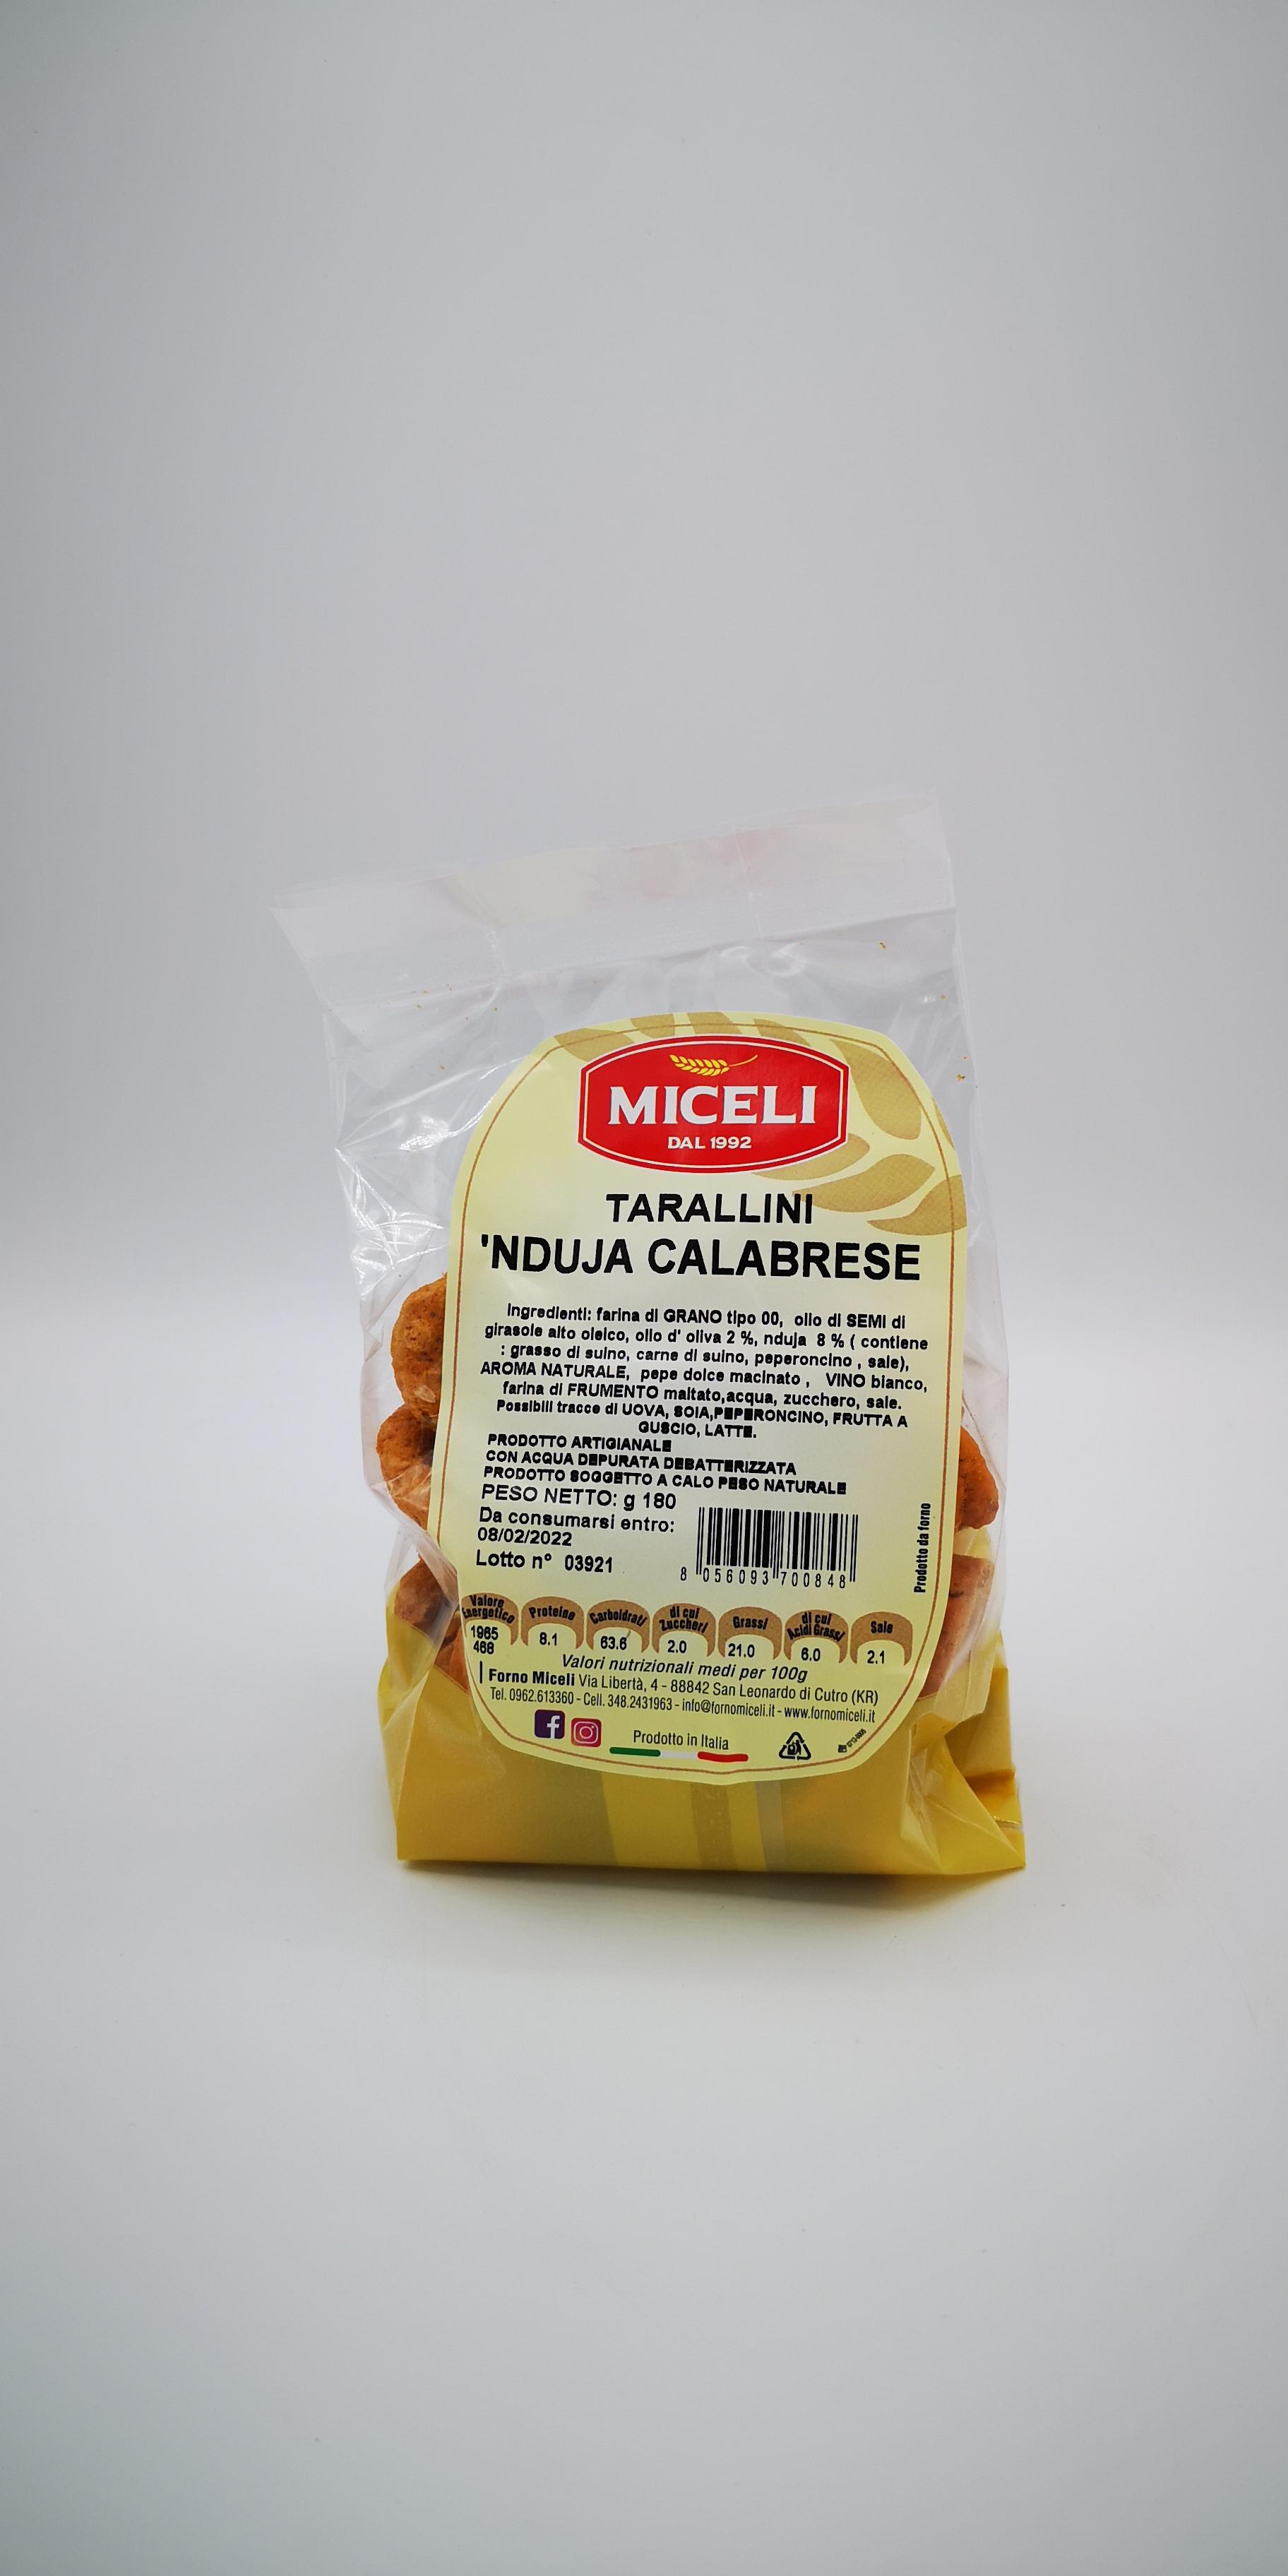 MICELI TARALLINI DI CUTRO ALLA NDUJA CALABRESE GR.180